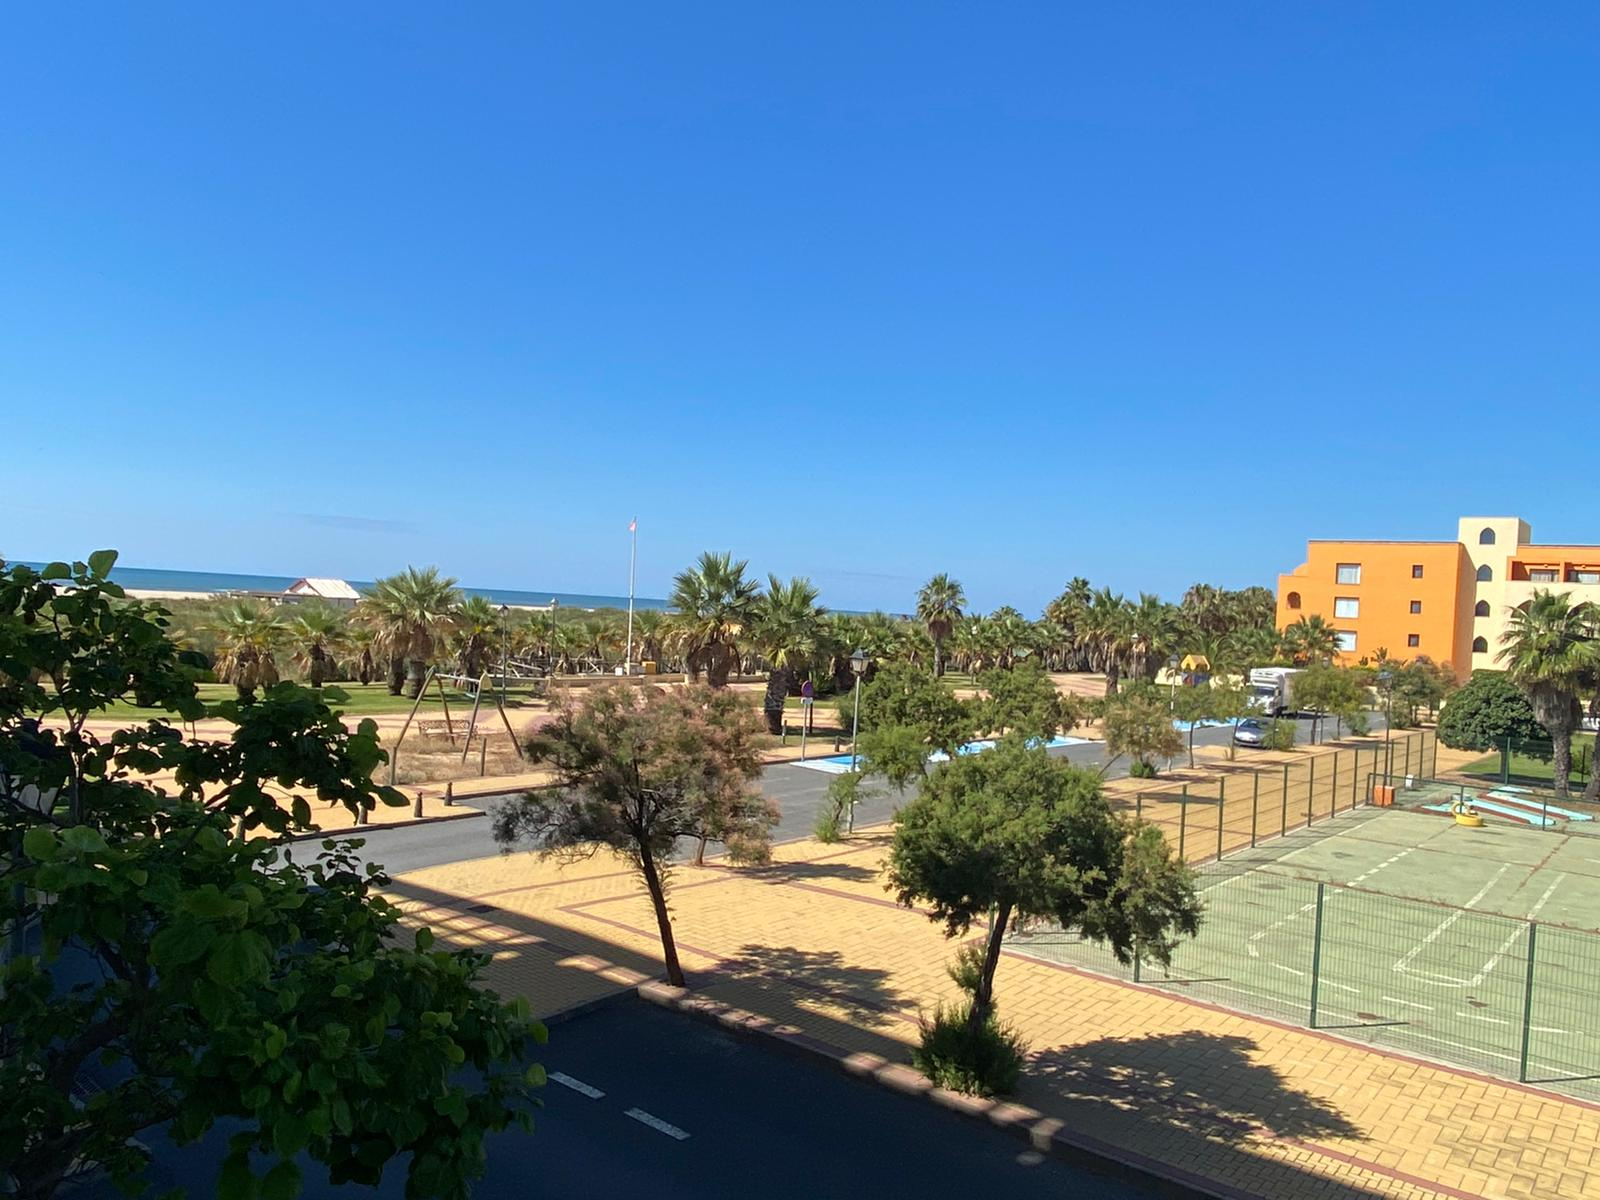 Imagen 28 del Apartamento en El Espigón, 1ª Planta nº4 Poniente (3d+2b), Punta del Moral (HUELVA), Paseo de la Cruz nº22